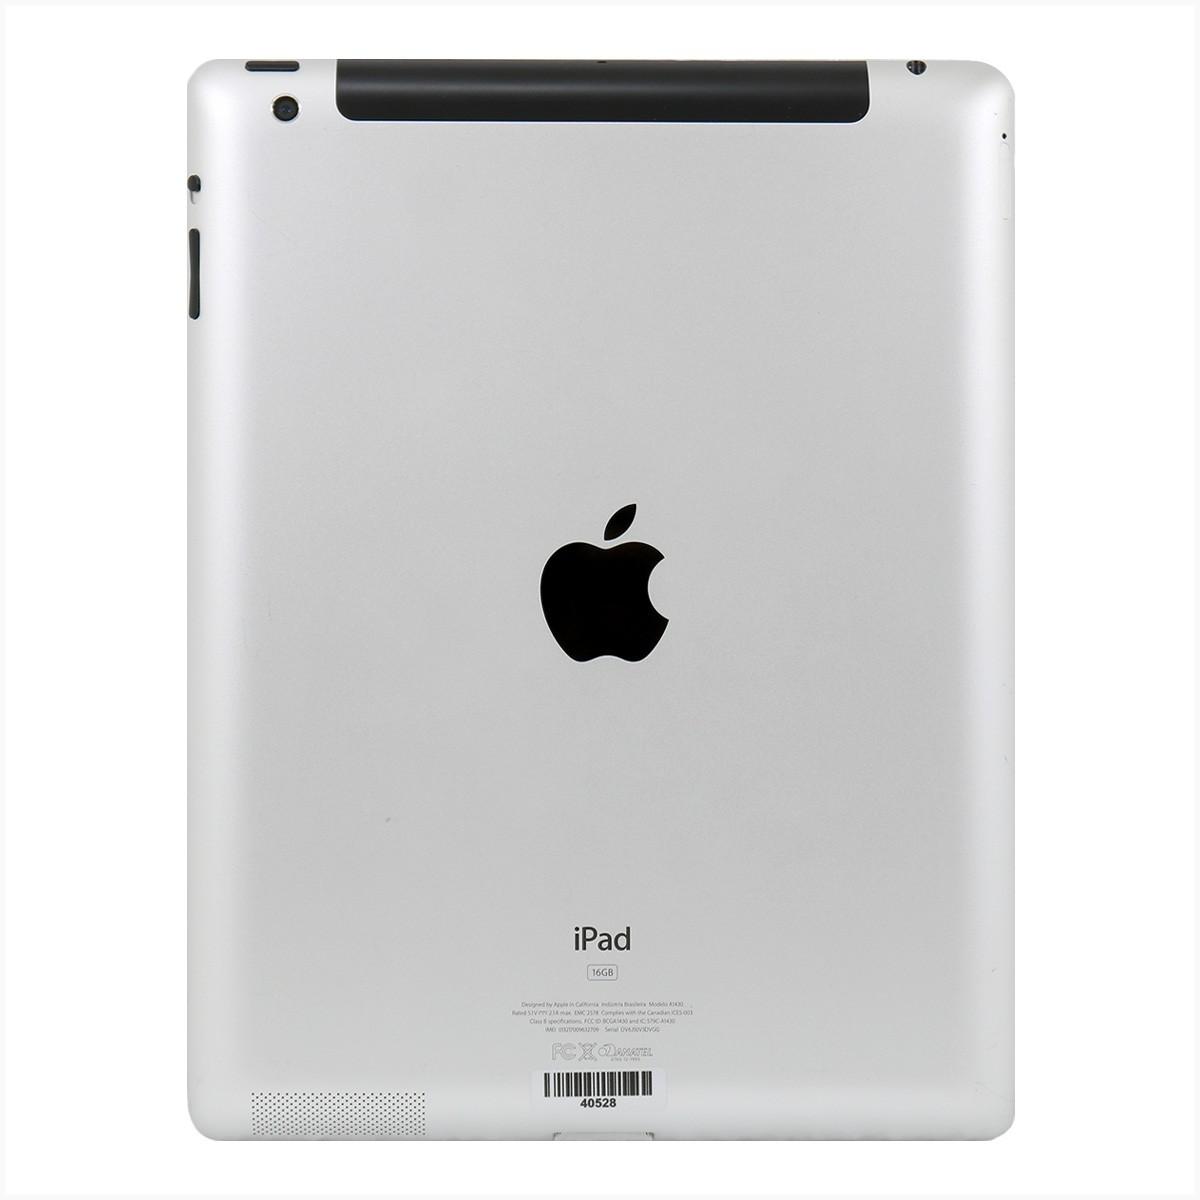 Ipad apple a1430 wi-fi - 4g 16gb preto - usado